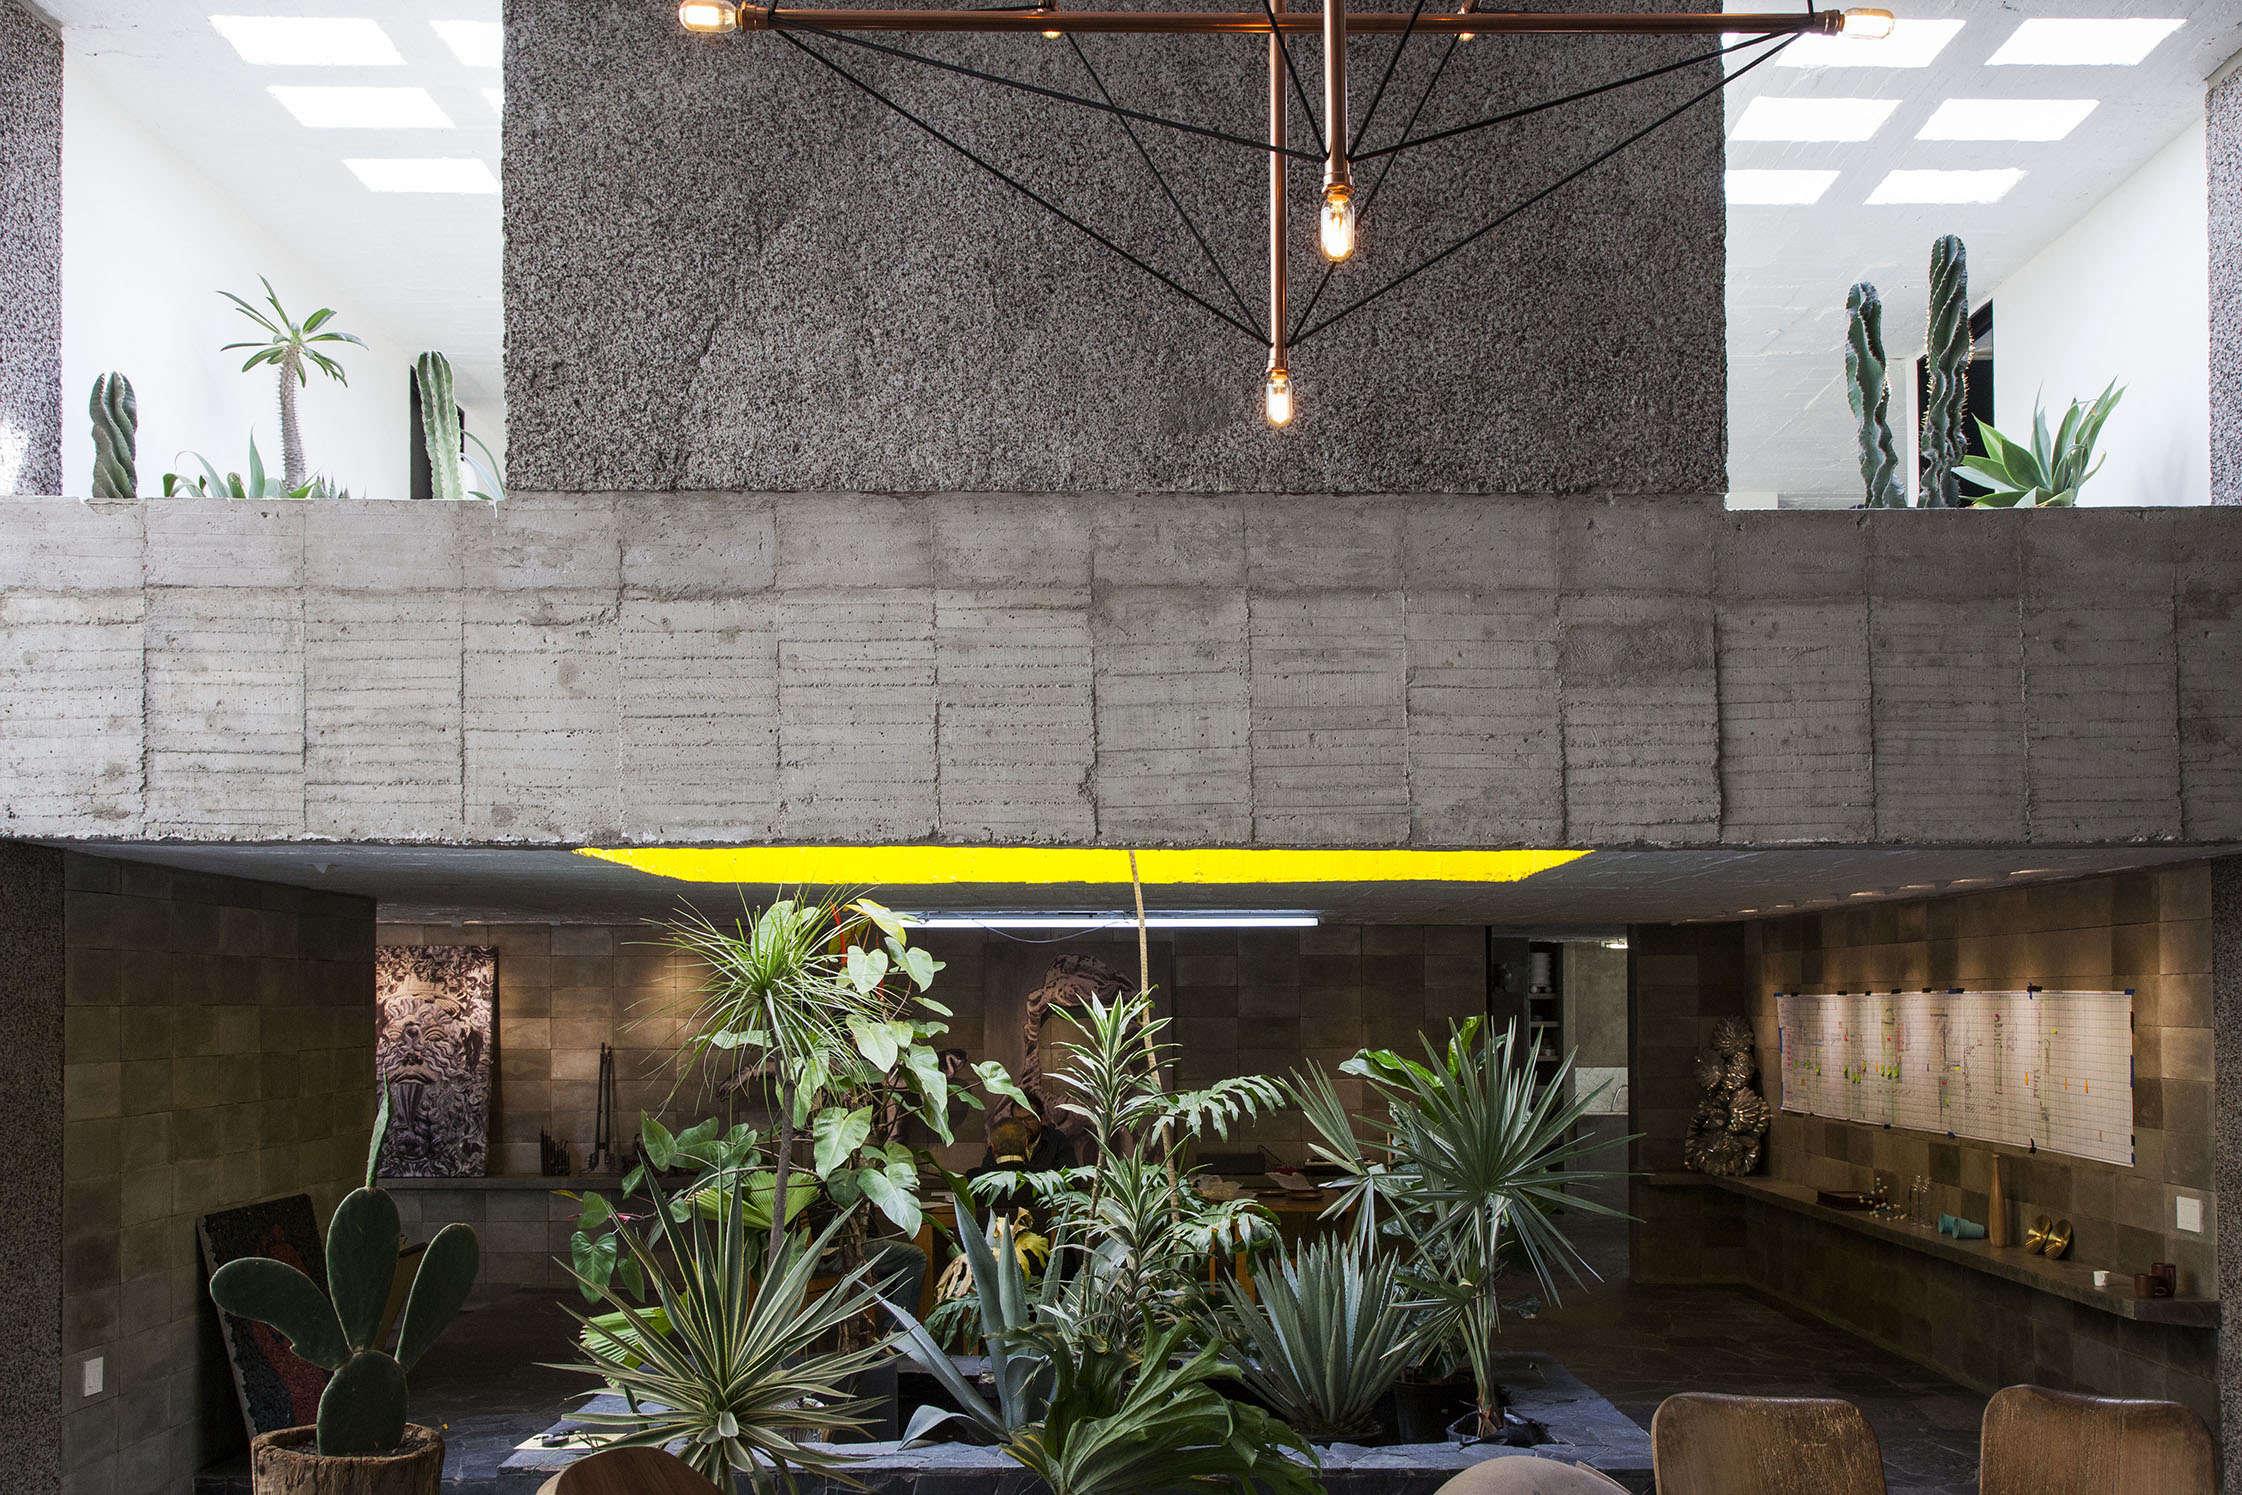 Pedro Reyes and Carla Fernandez's Brutalist house in Mexico City via FvF | Remodelista